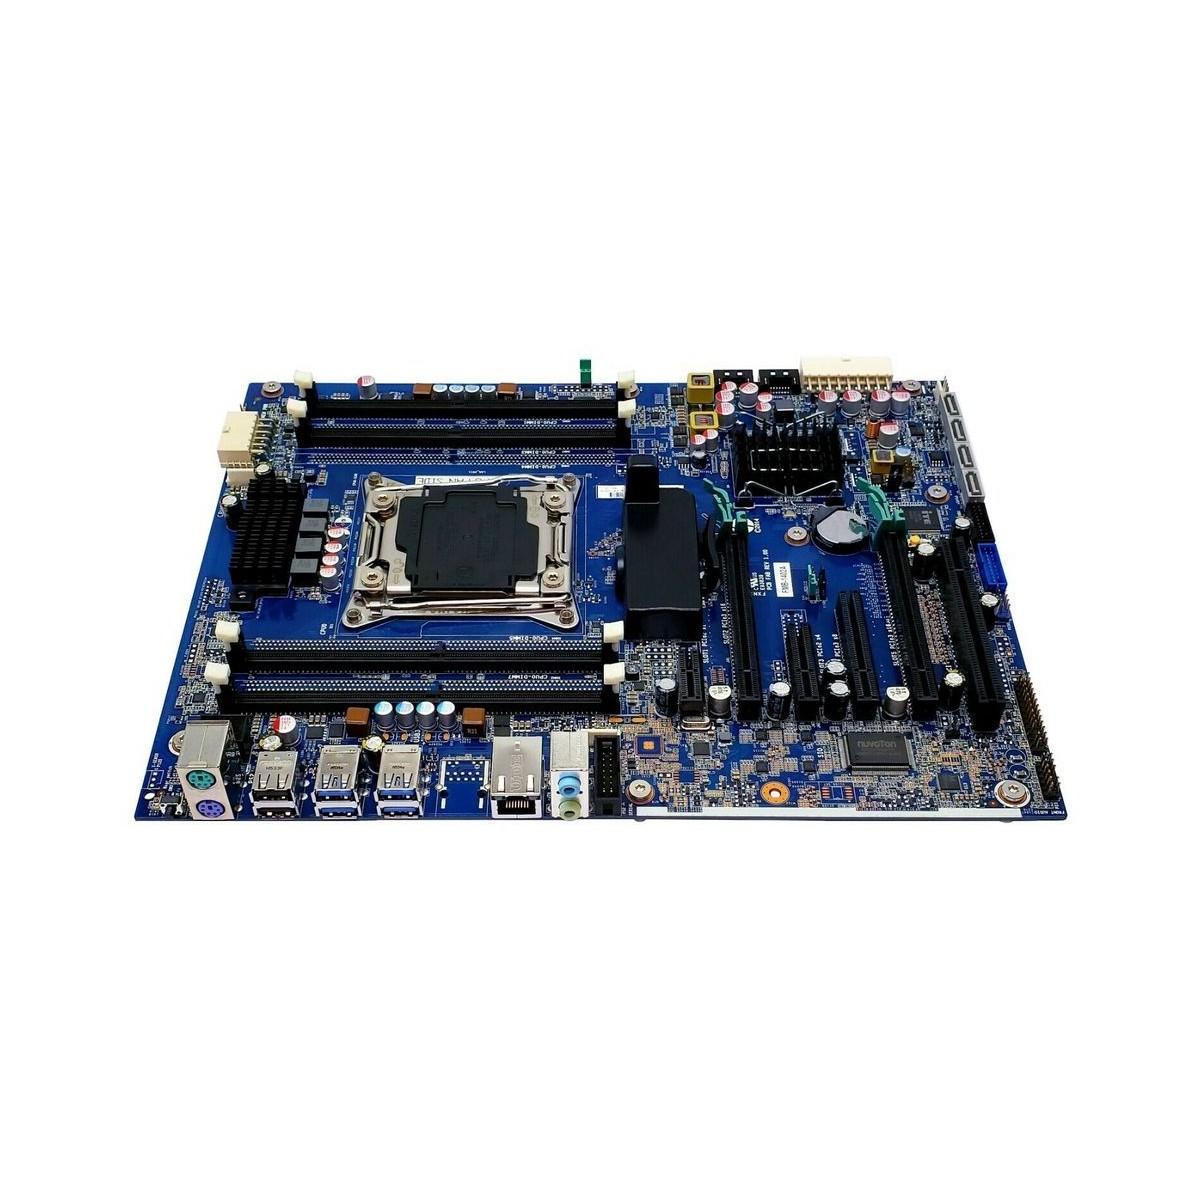 PAMIEC KINGSTON 4GB 2RX8 PC3L-10600E ECC KR1P7-HYB